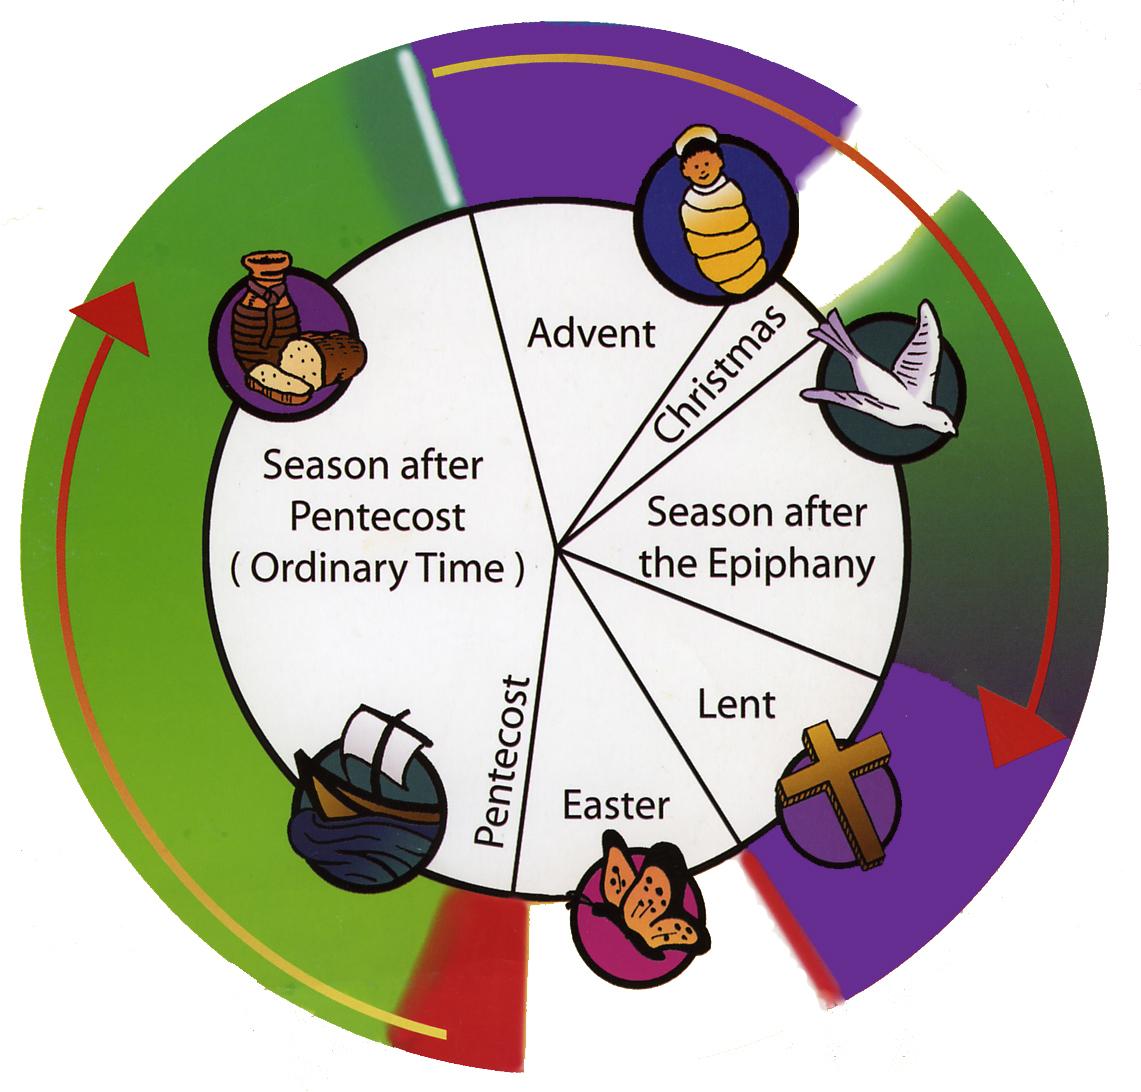 Why I Observe Lent (and the Liturgical Calendar) | DanielTomberlin.net